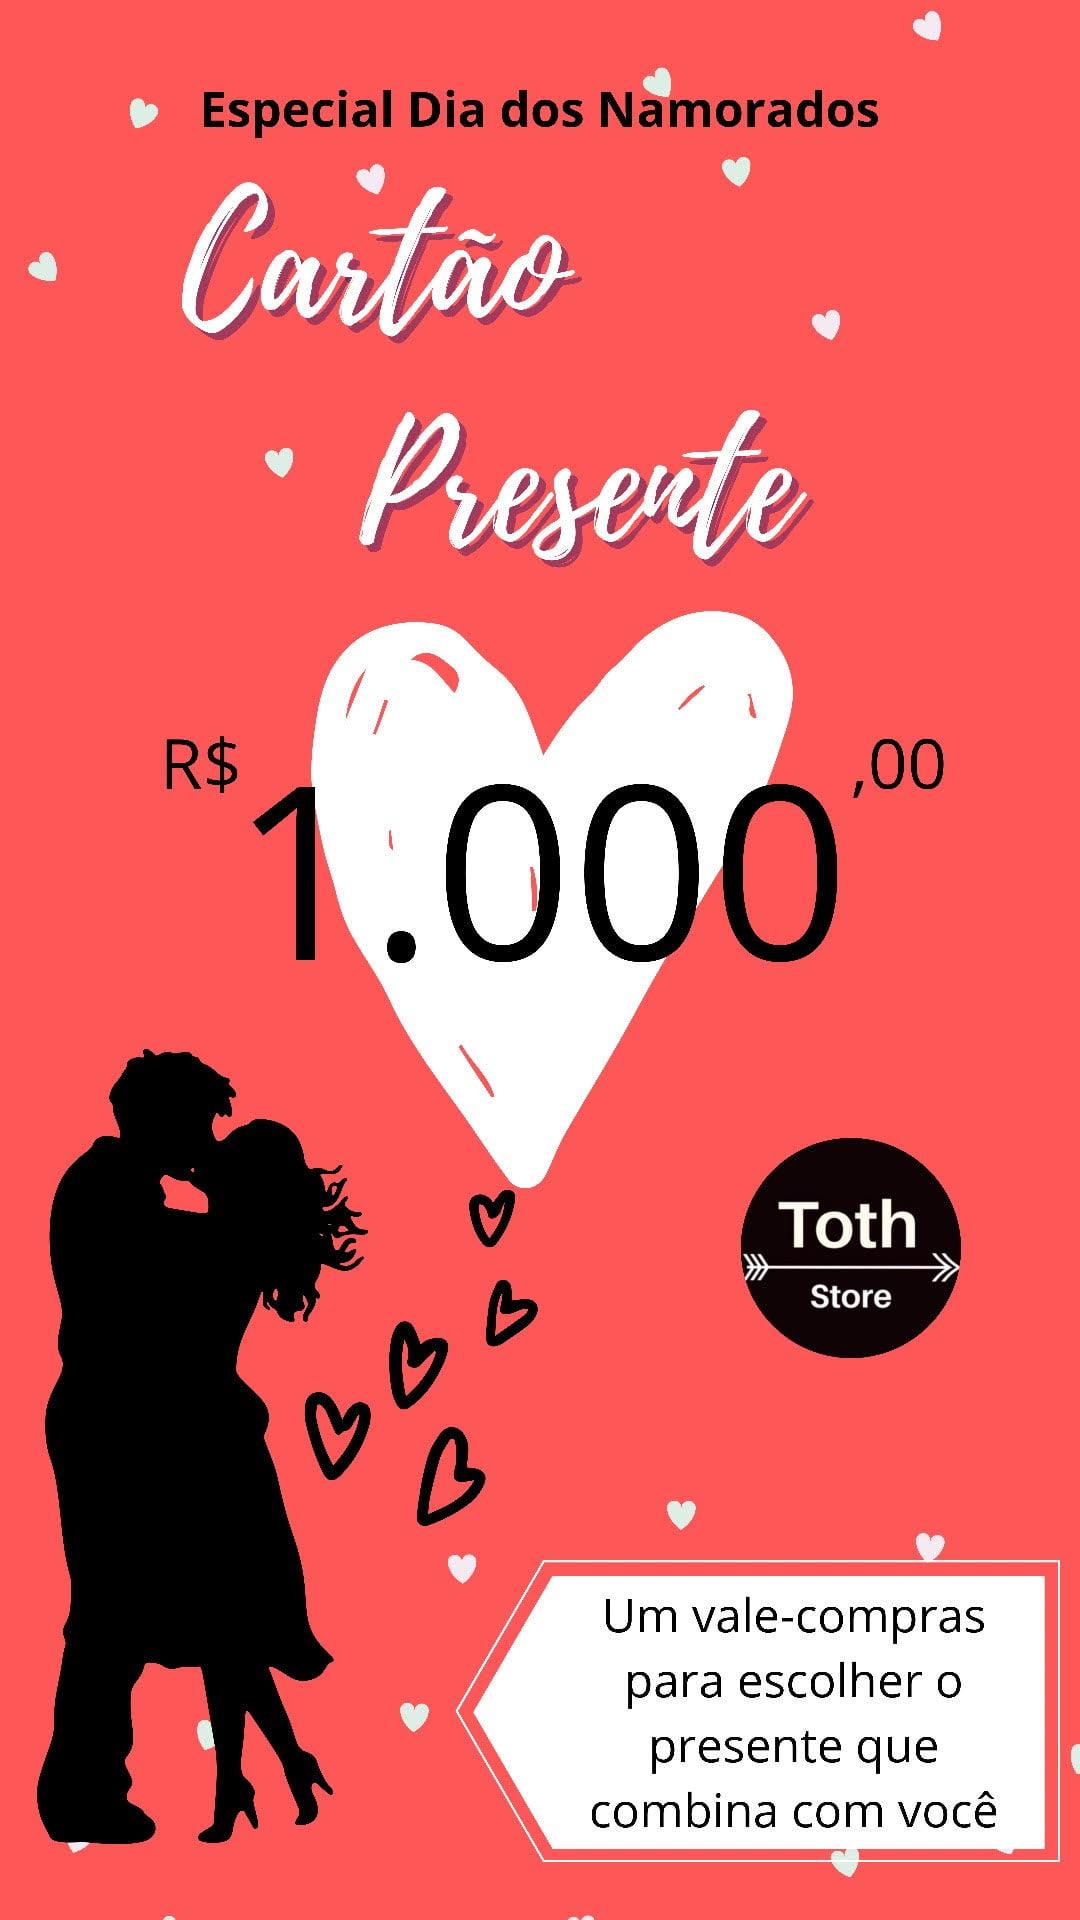 CARTÃO VALE PRESENTE R$ 1000,00